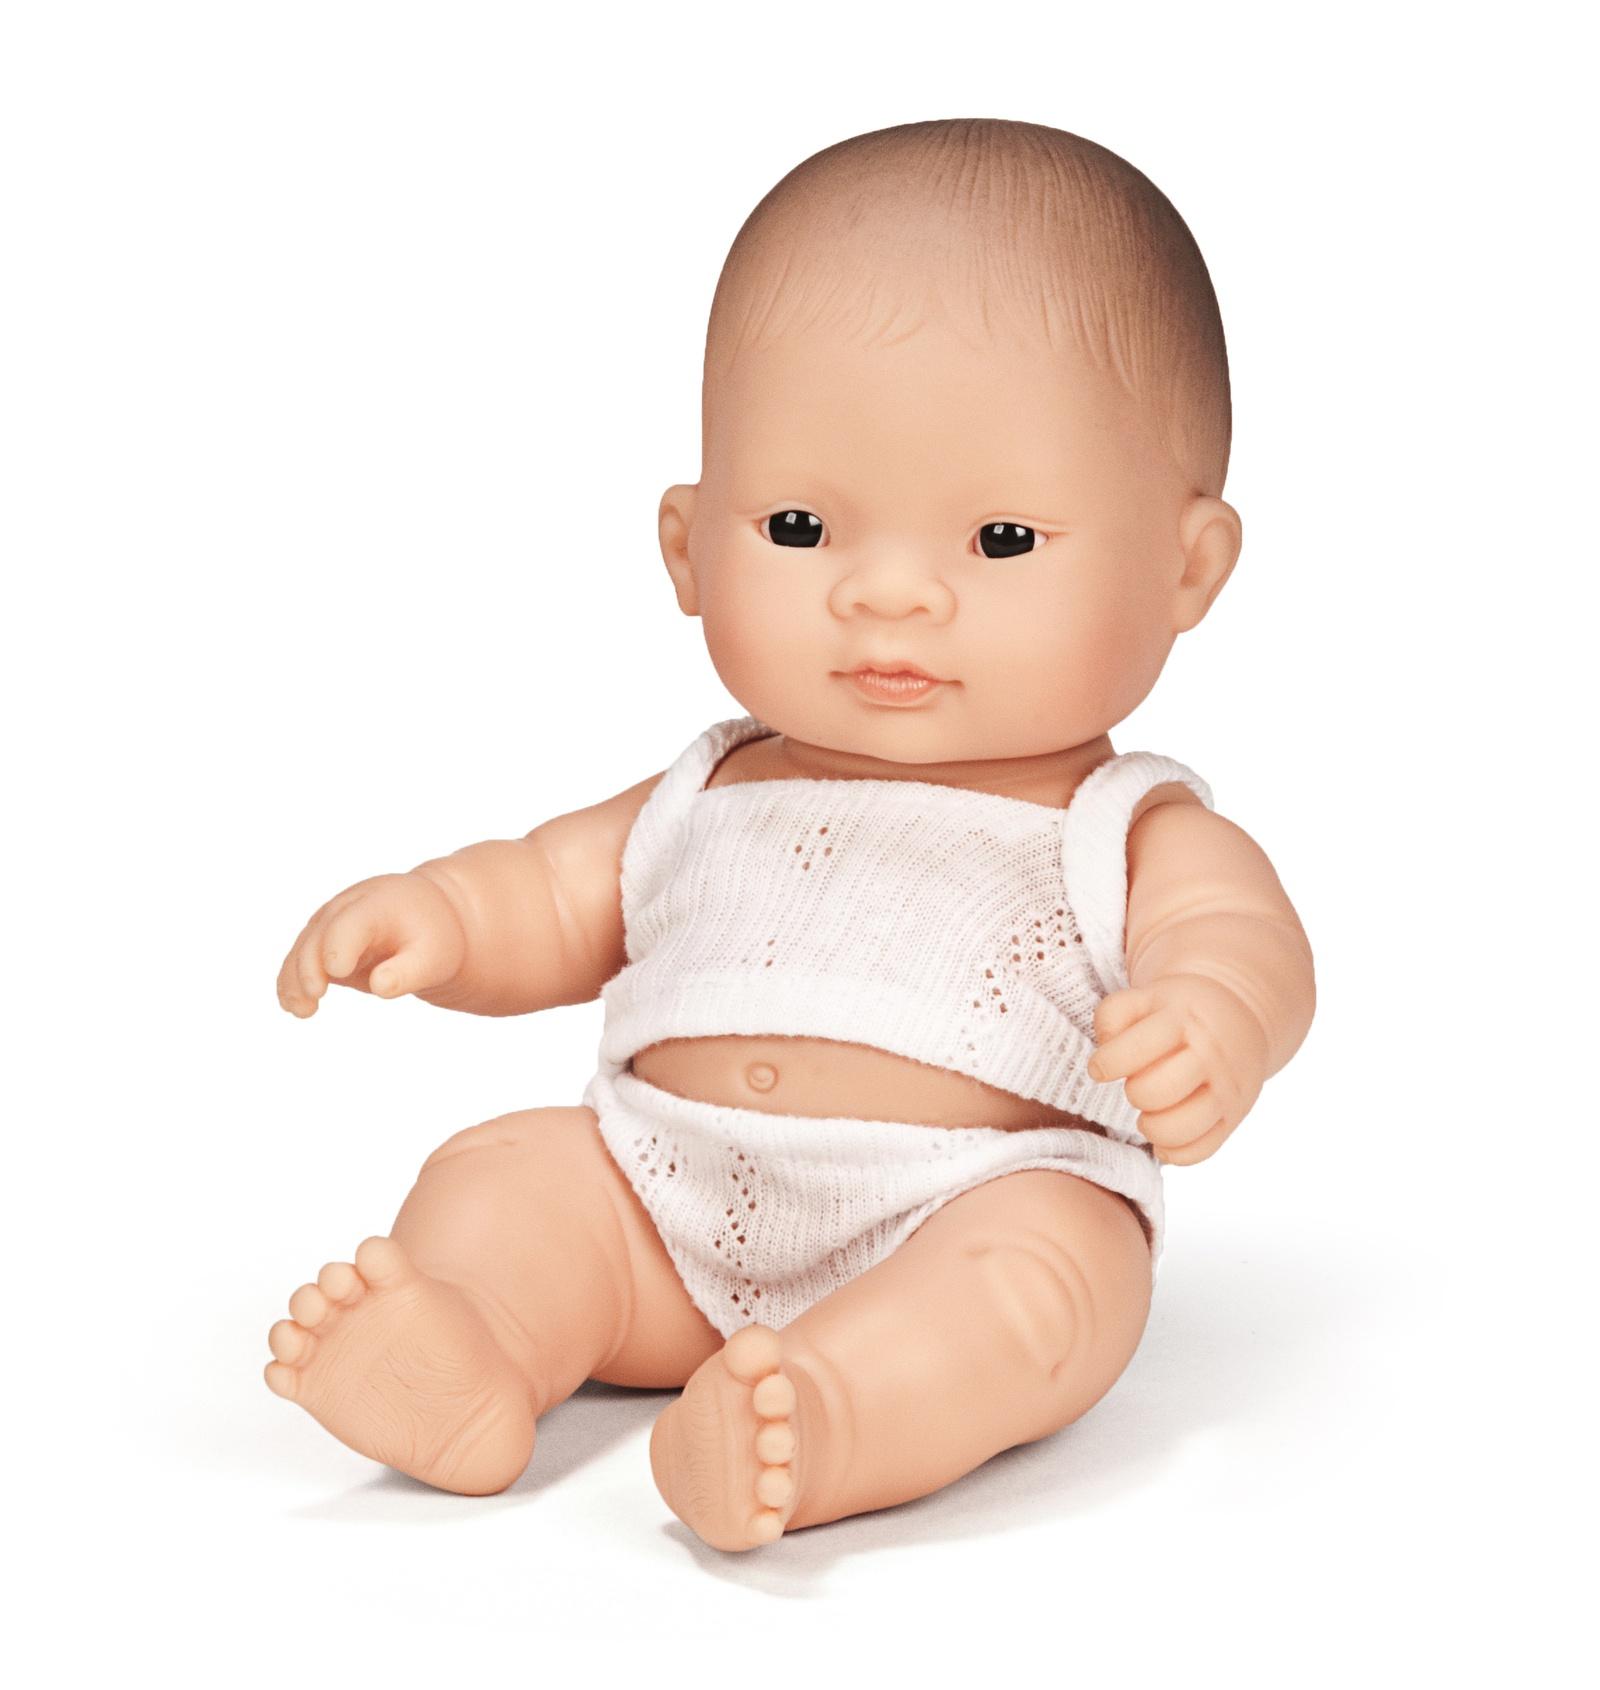 Кукла Miniland Мальчик азиат 21 см